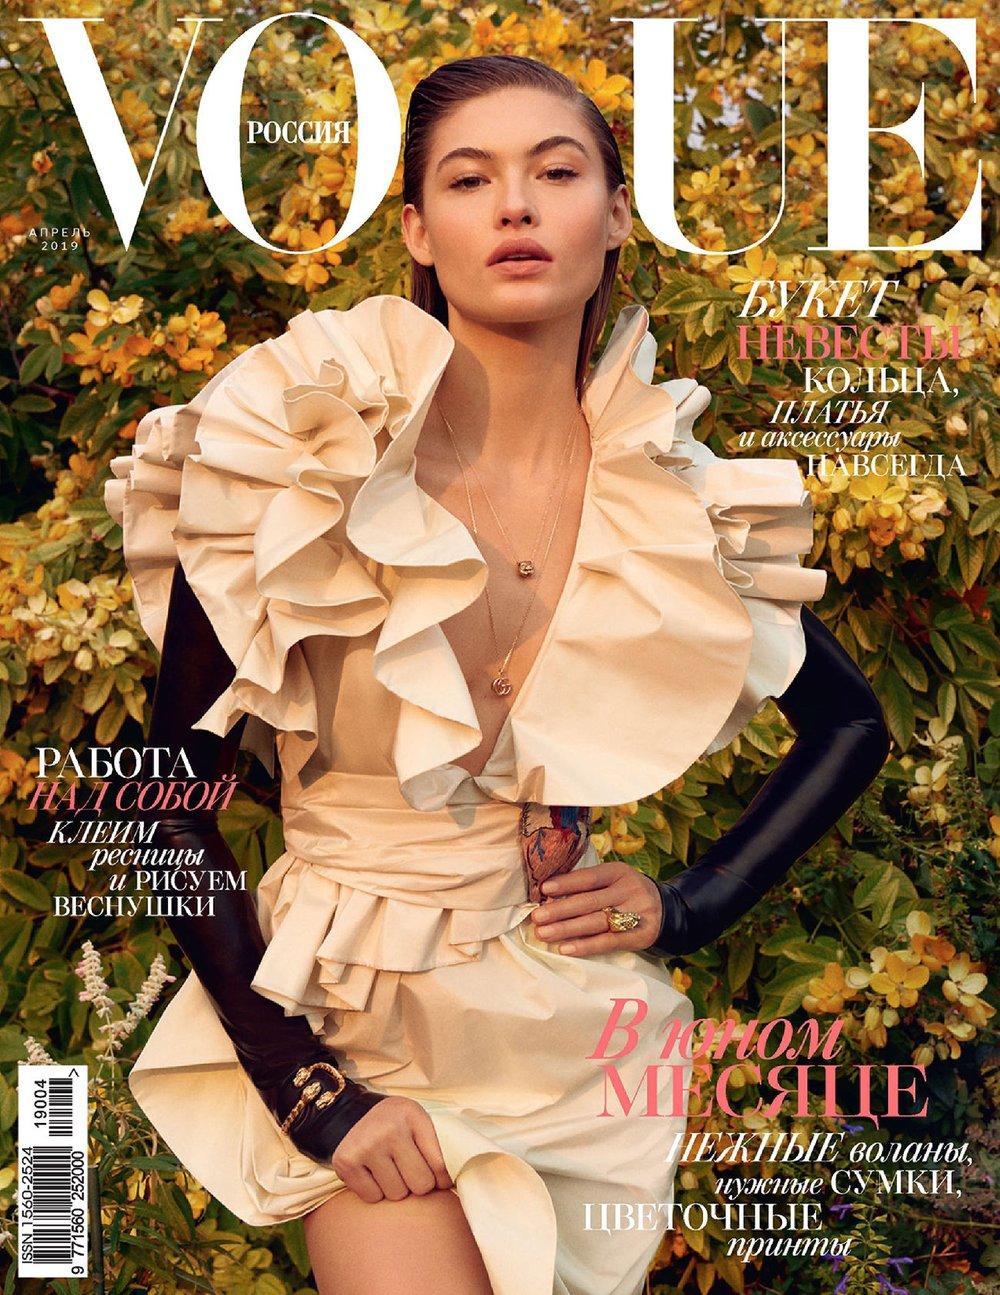 Grace-Elizabeth-Yelena-Yemchuk-Vogue-Russia-April-2019 (7).jpg